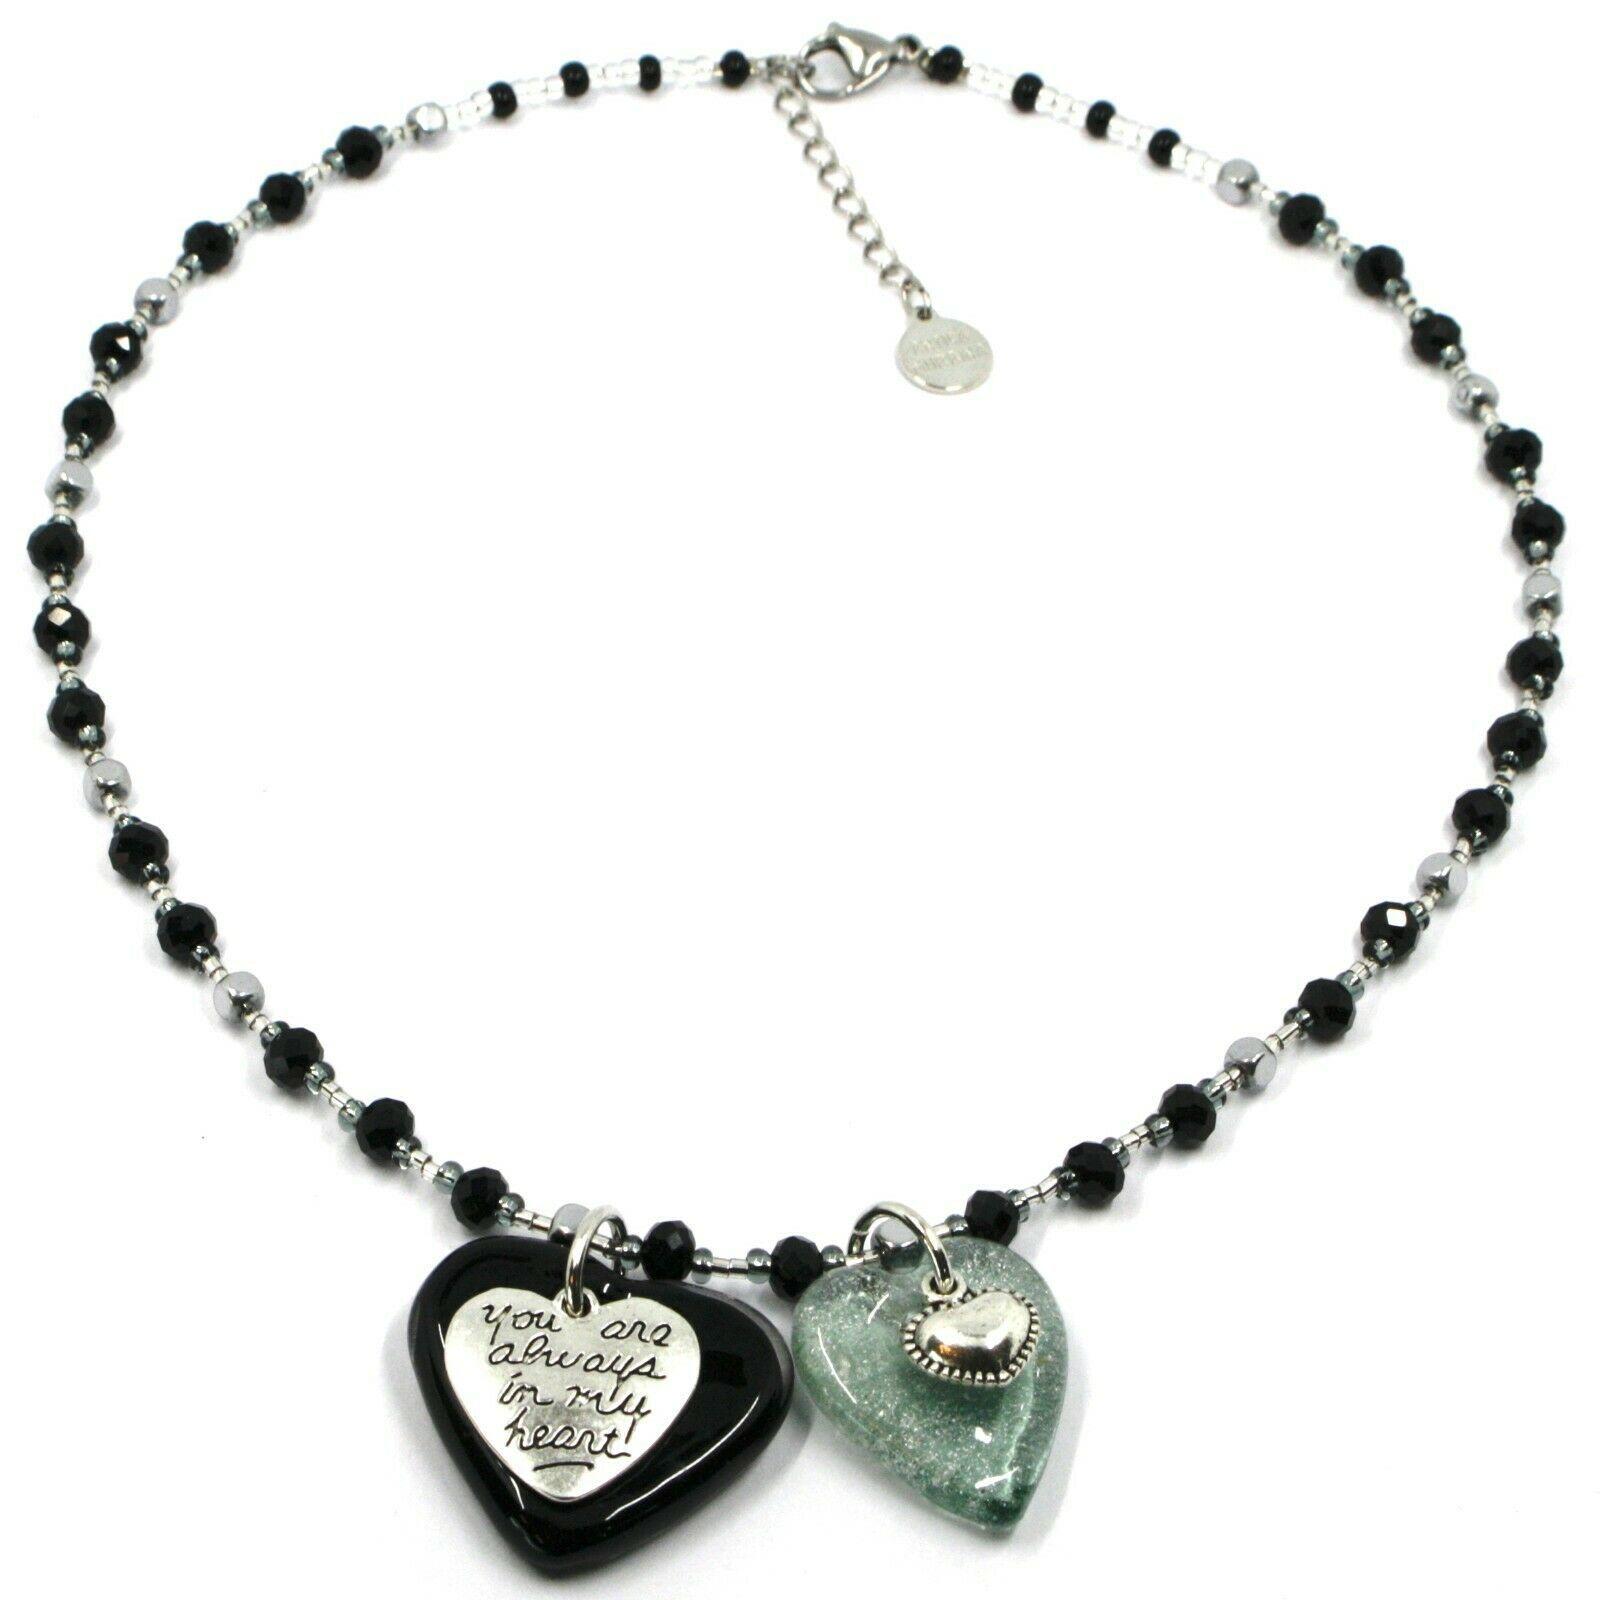 Necklace Antica Murrina Venezia, COB60A14, Double Heart Glass Black Pendant